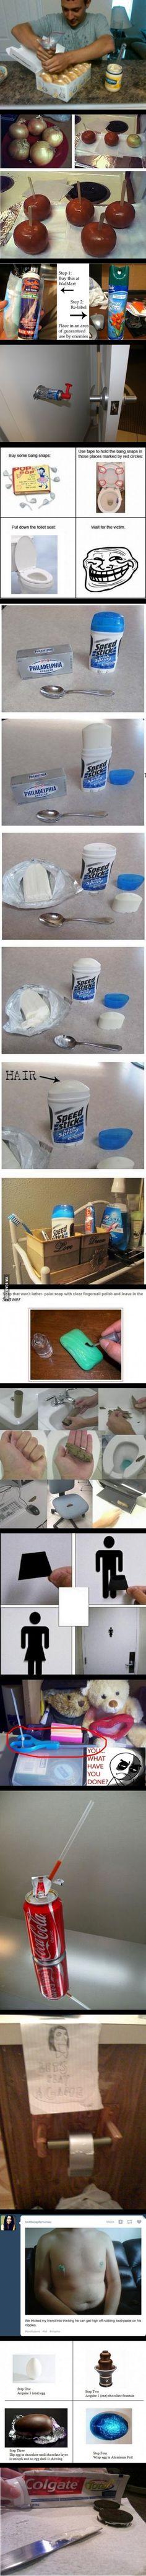 Hilarious but evil pranks.